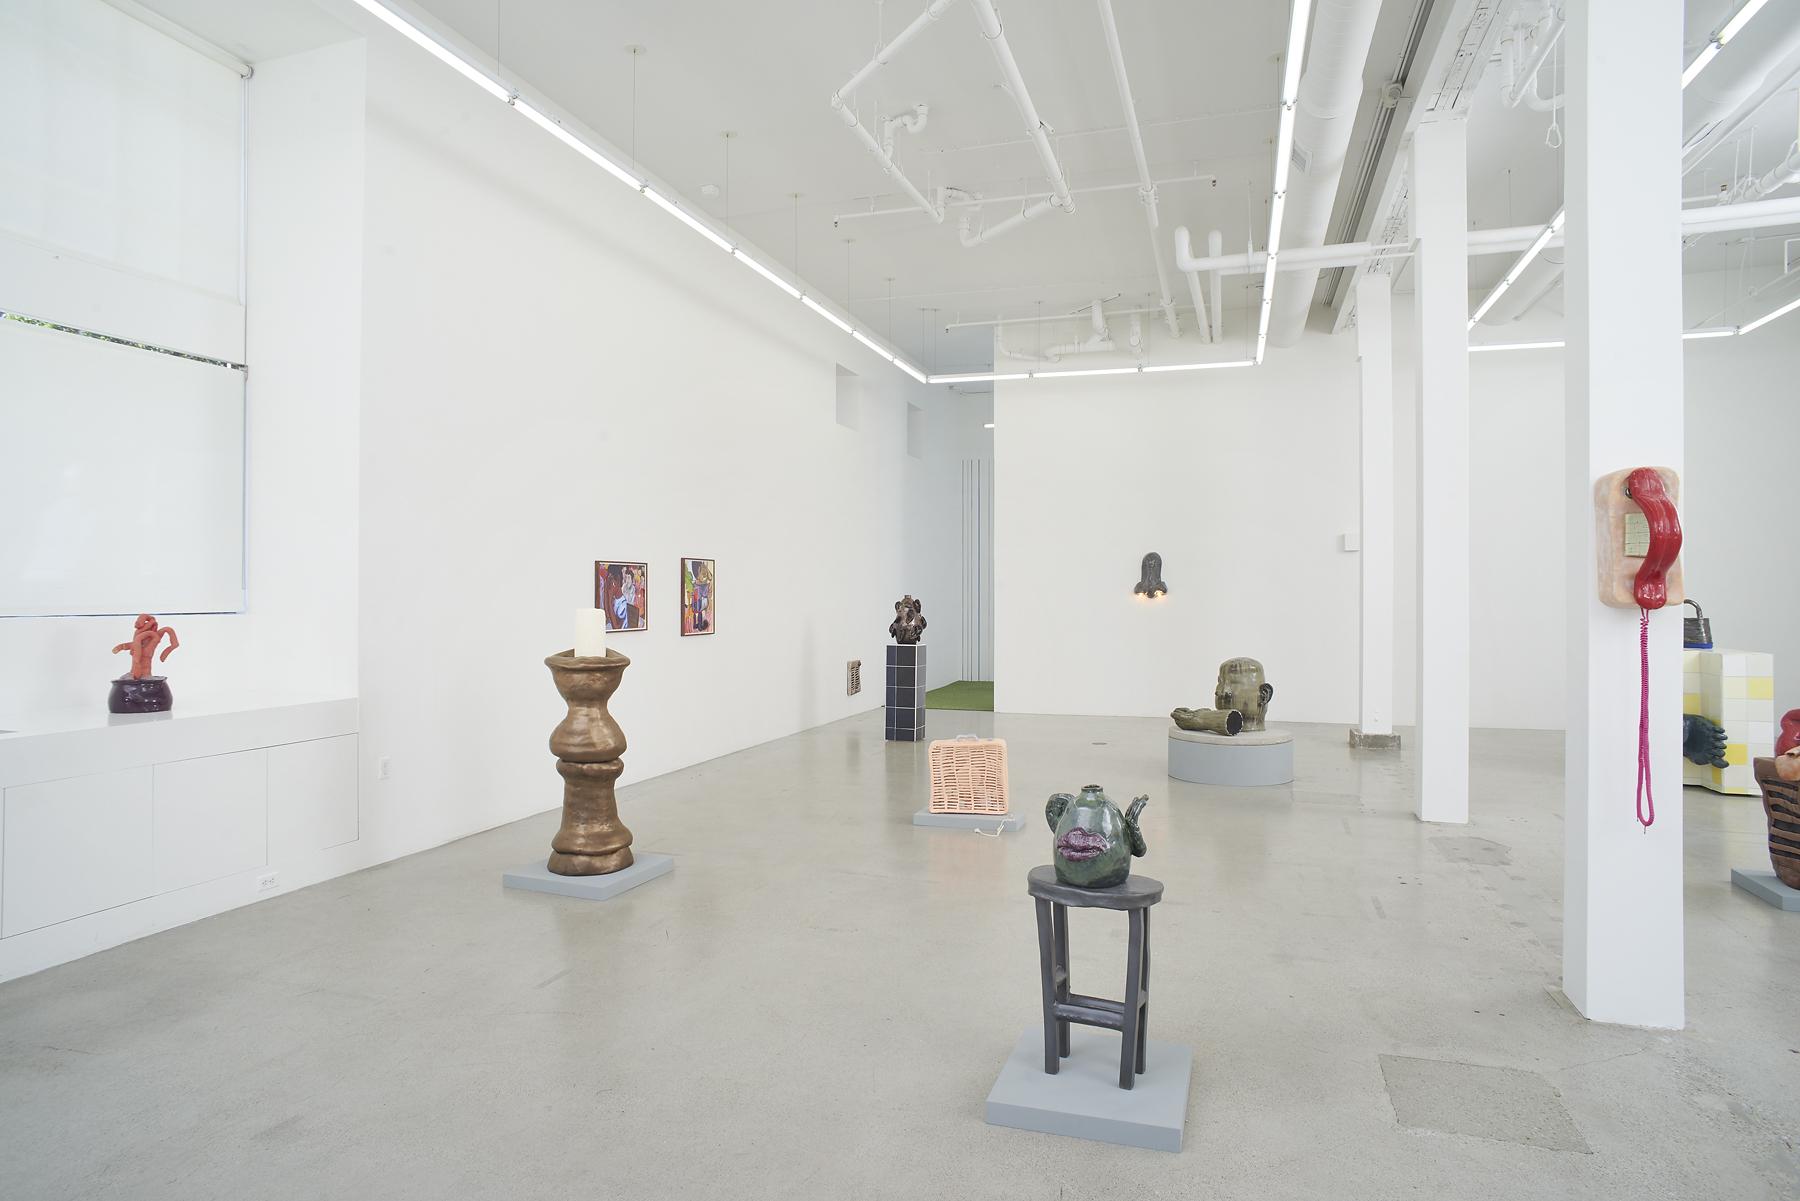 Othello_Living Room, 2018_Jessica Silverman Gallery_Installation view 13.PRS.jpg